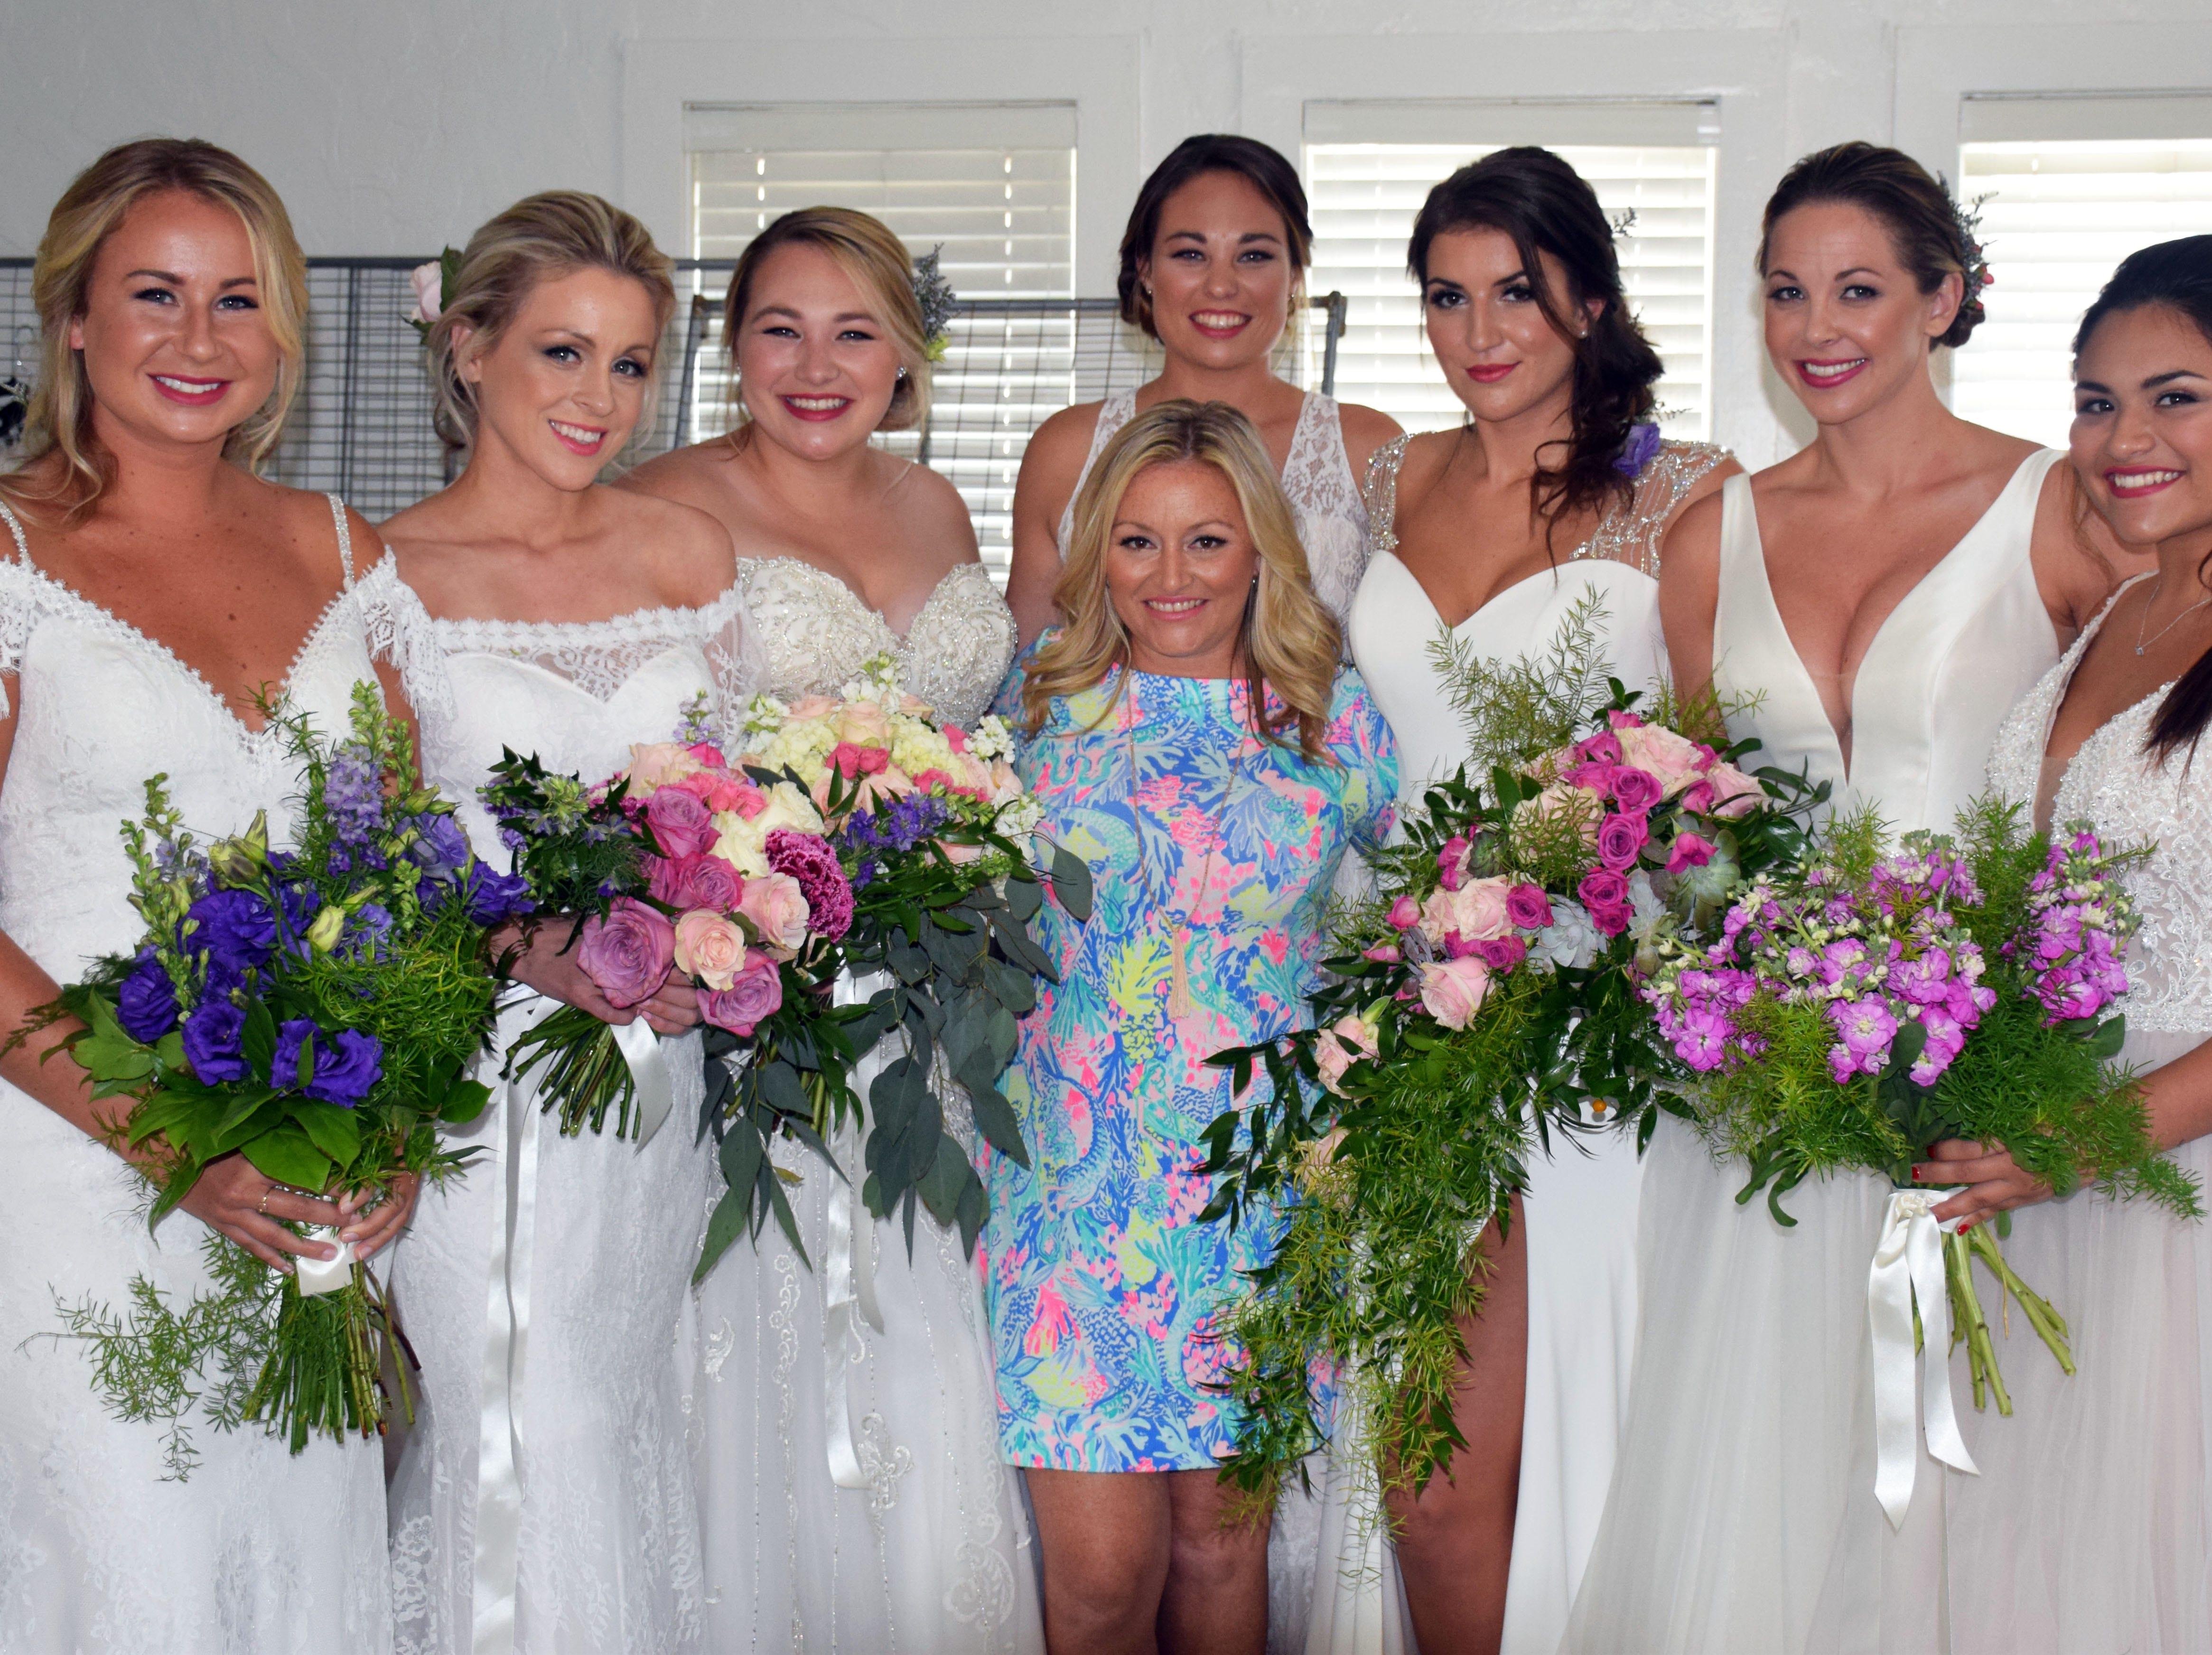 Devon Landman, Lisa Du Camp, Lindley Wilson, Nicki Maslin, Layla Wilson, Jessica Augustine, Kelly Clemenzi and Selina Presley